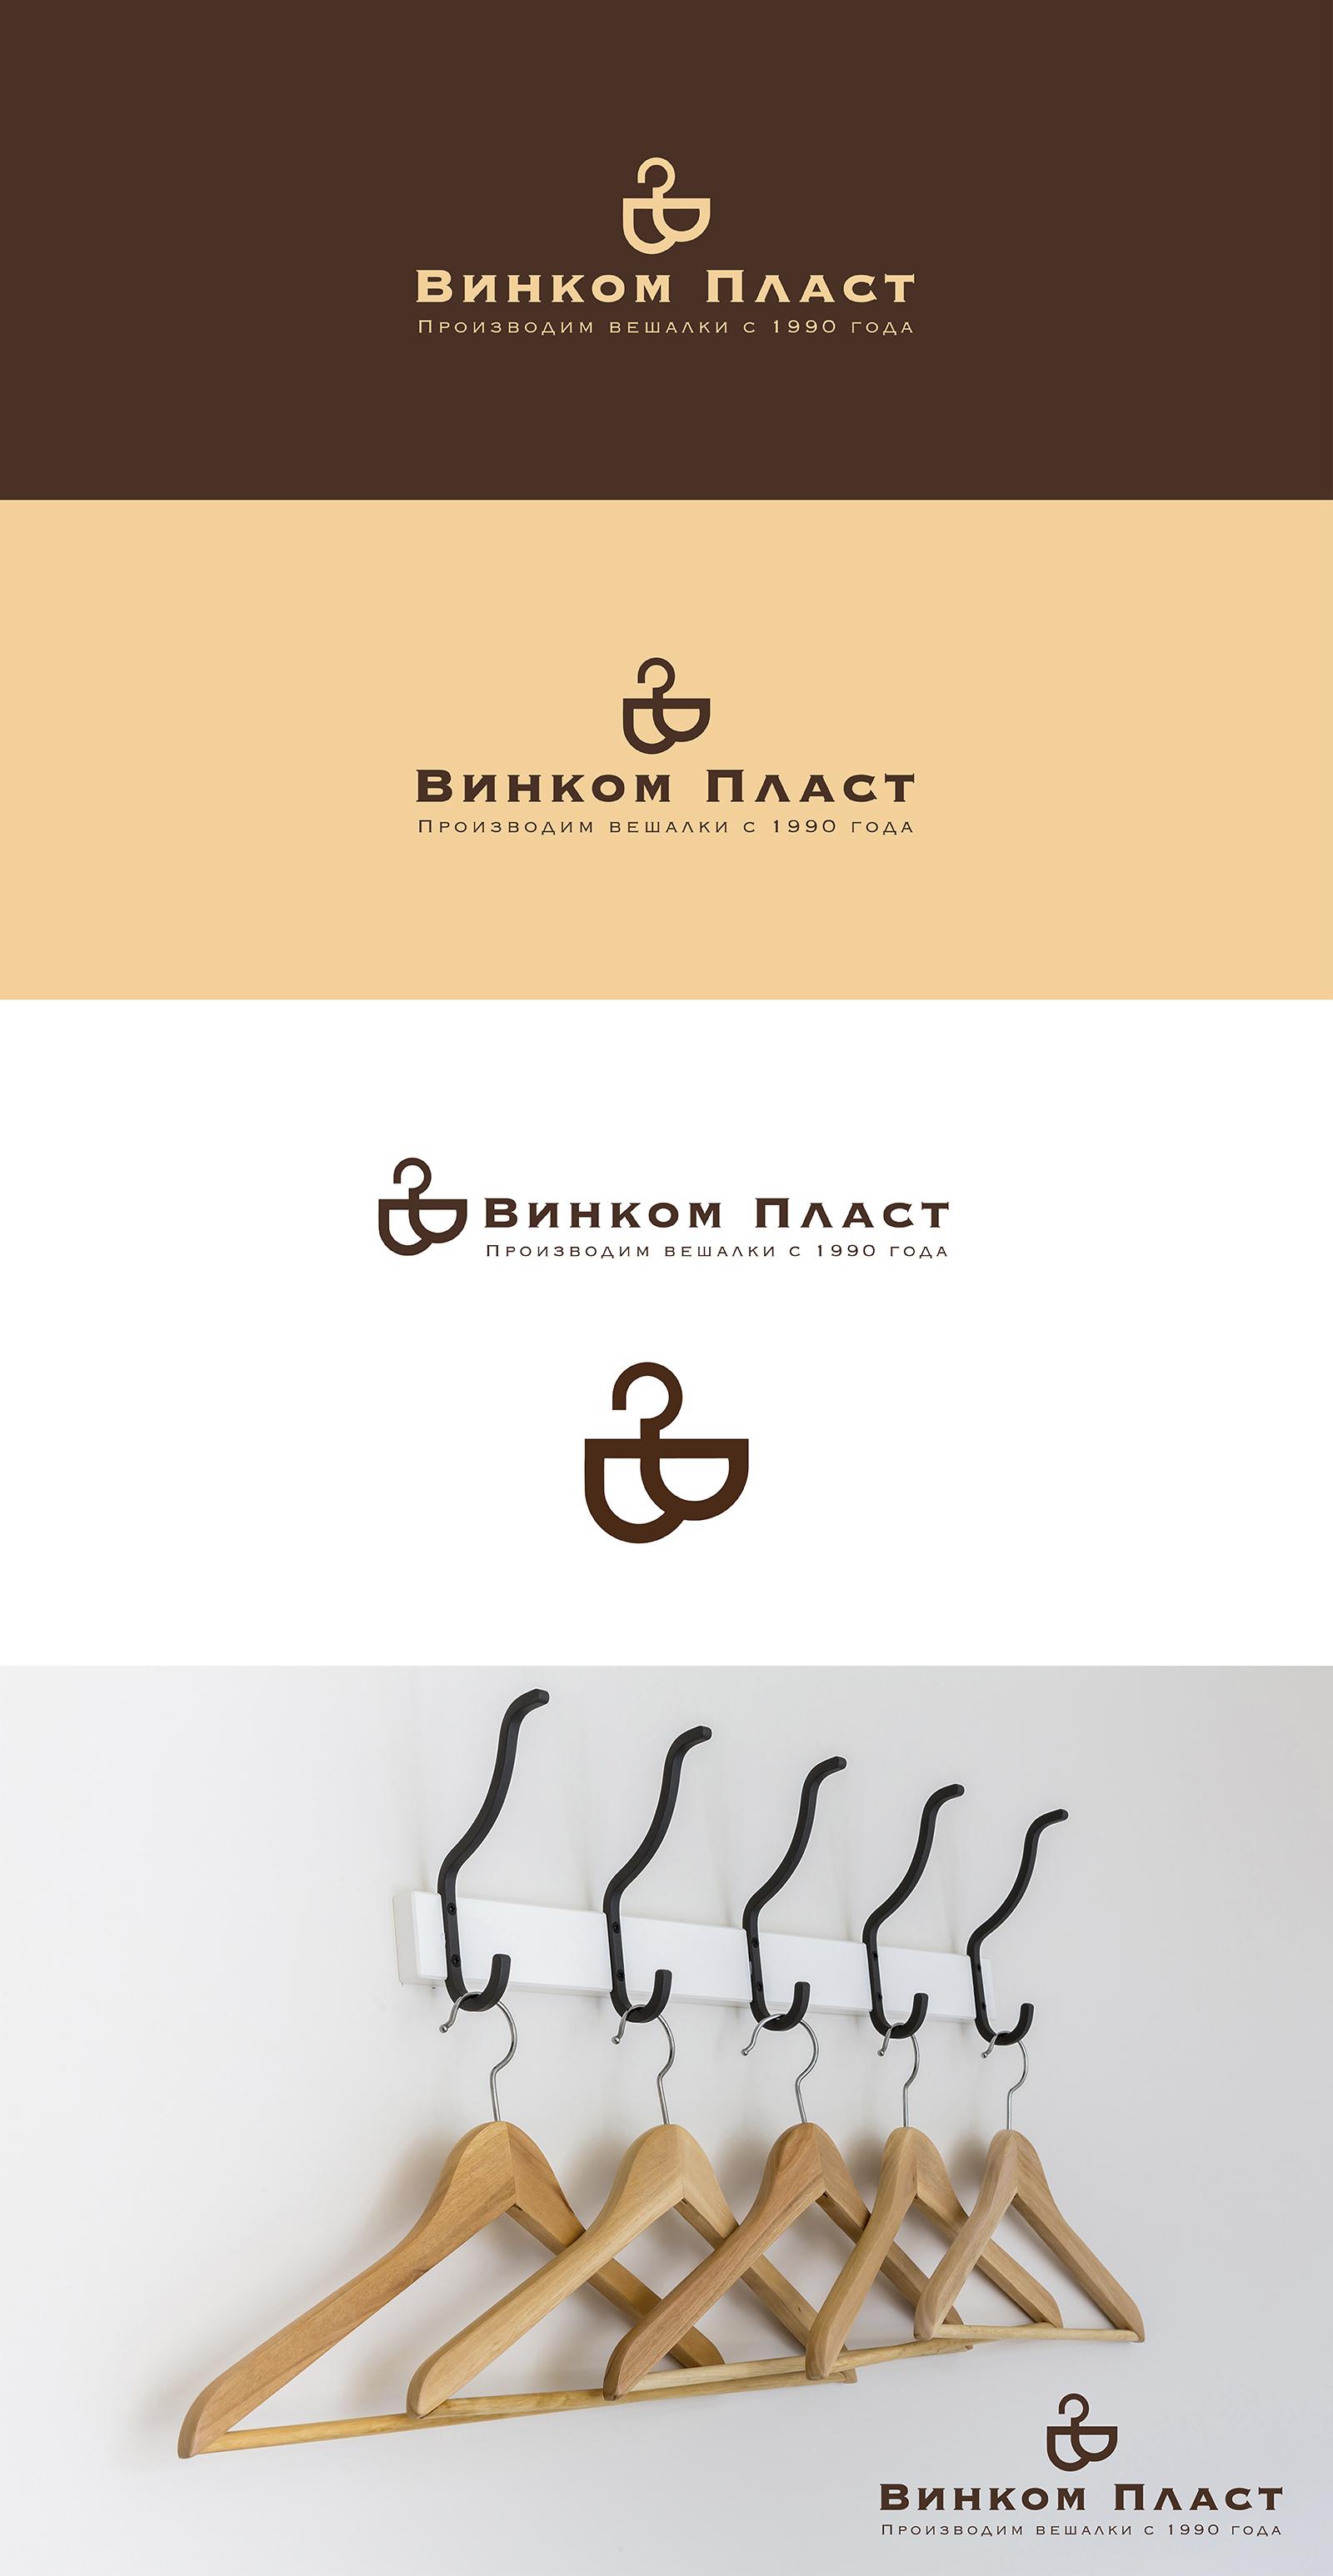 Логотип, фавикон и визитка для компании Винком Пласт  фото f_3865c3c8310c88a9.jpg